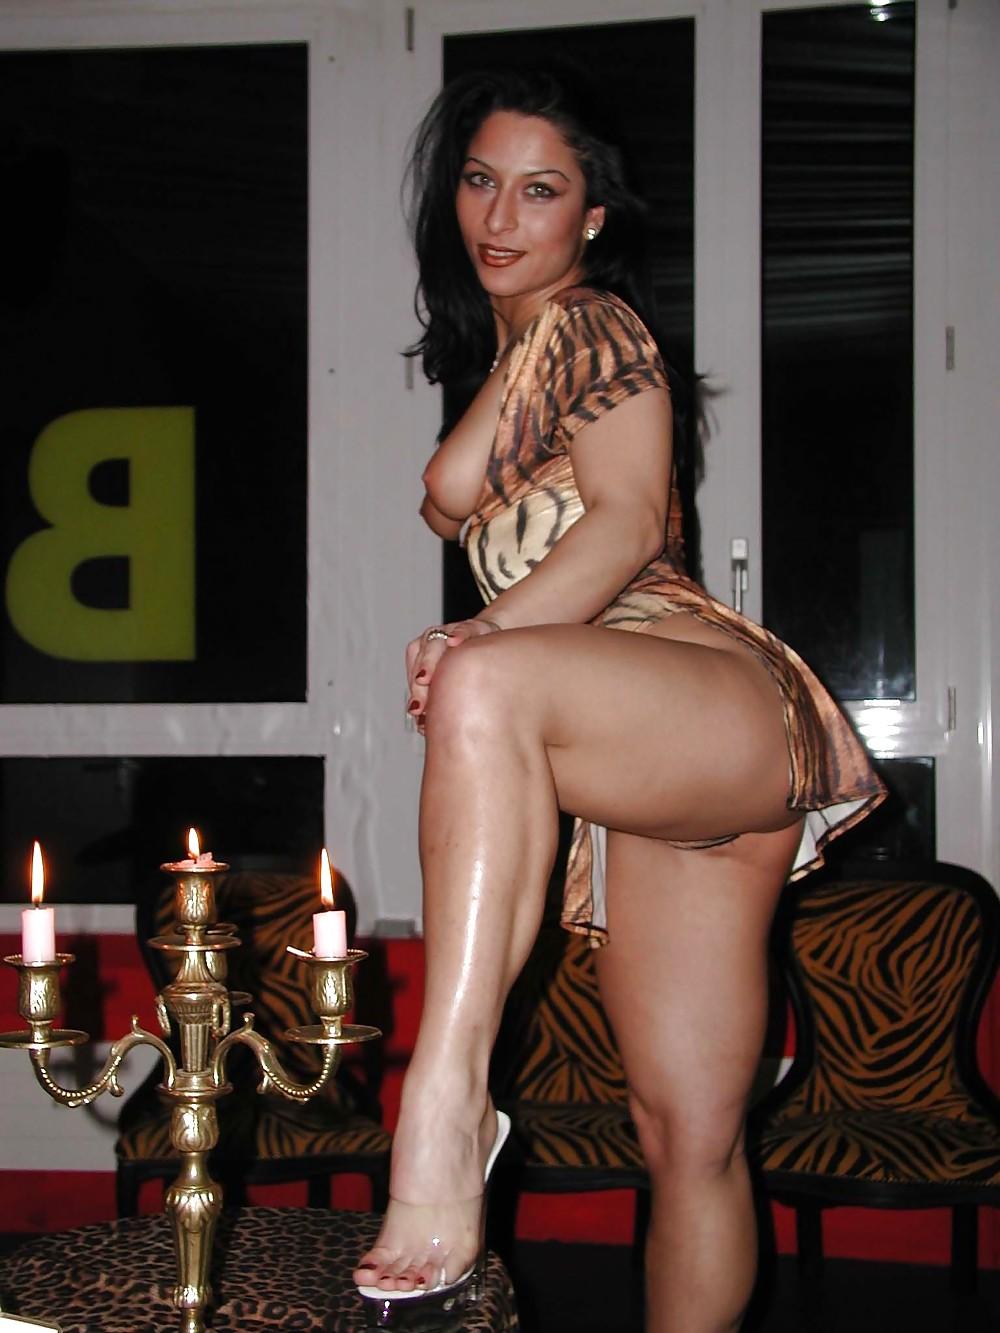 Thick Italian Milf Porn Pics #6907627